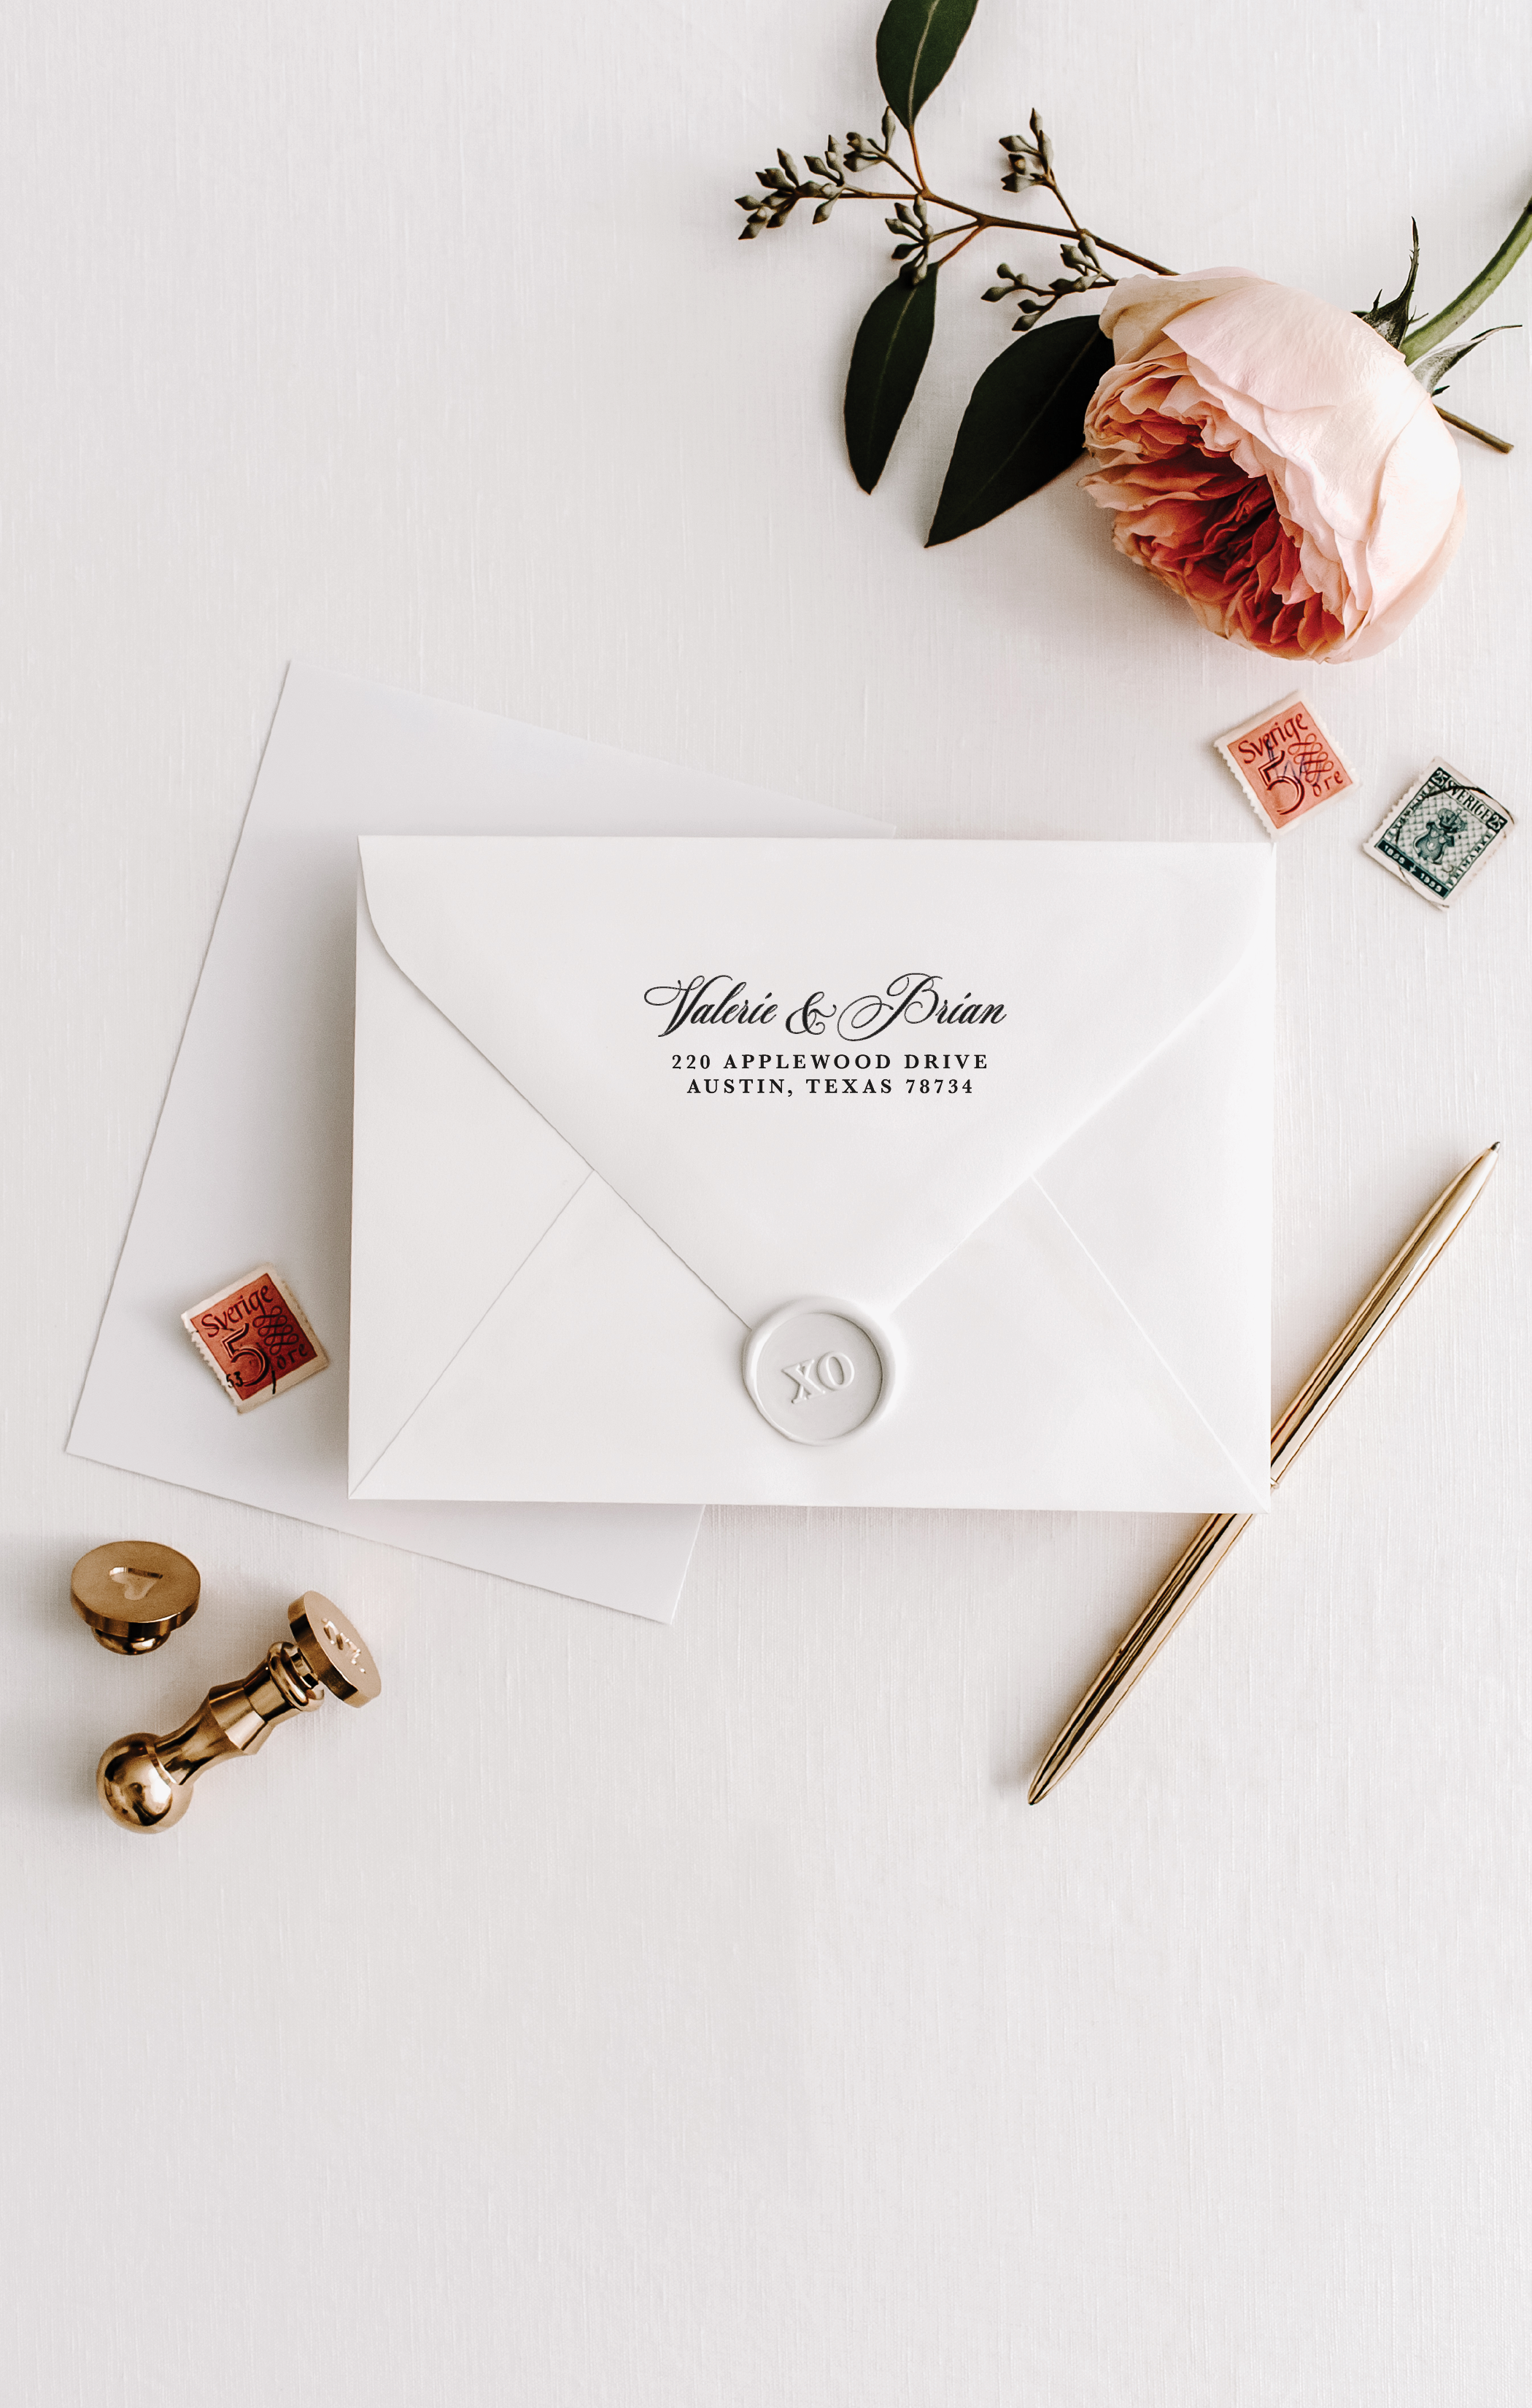 Wedding Return Address Stamp.png